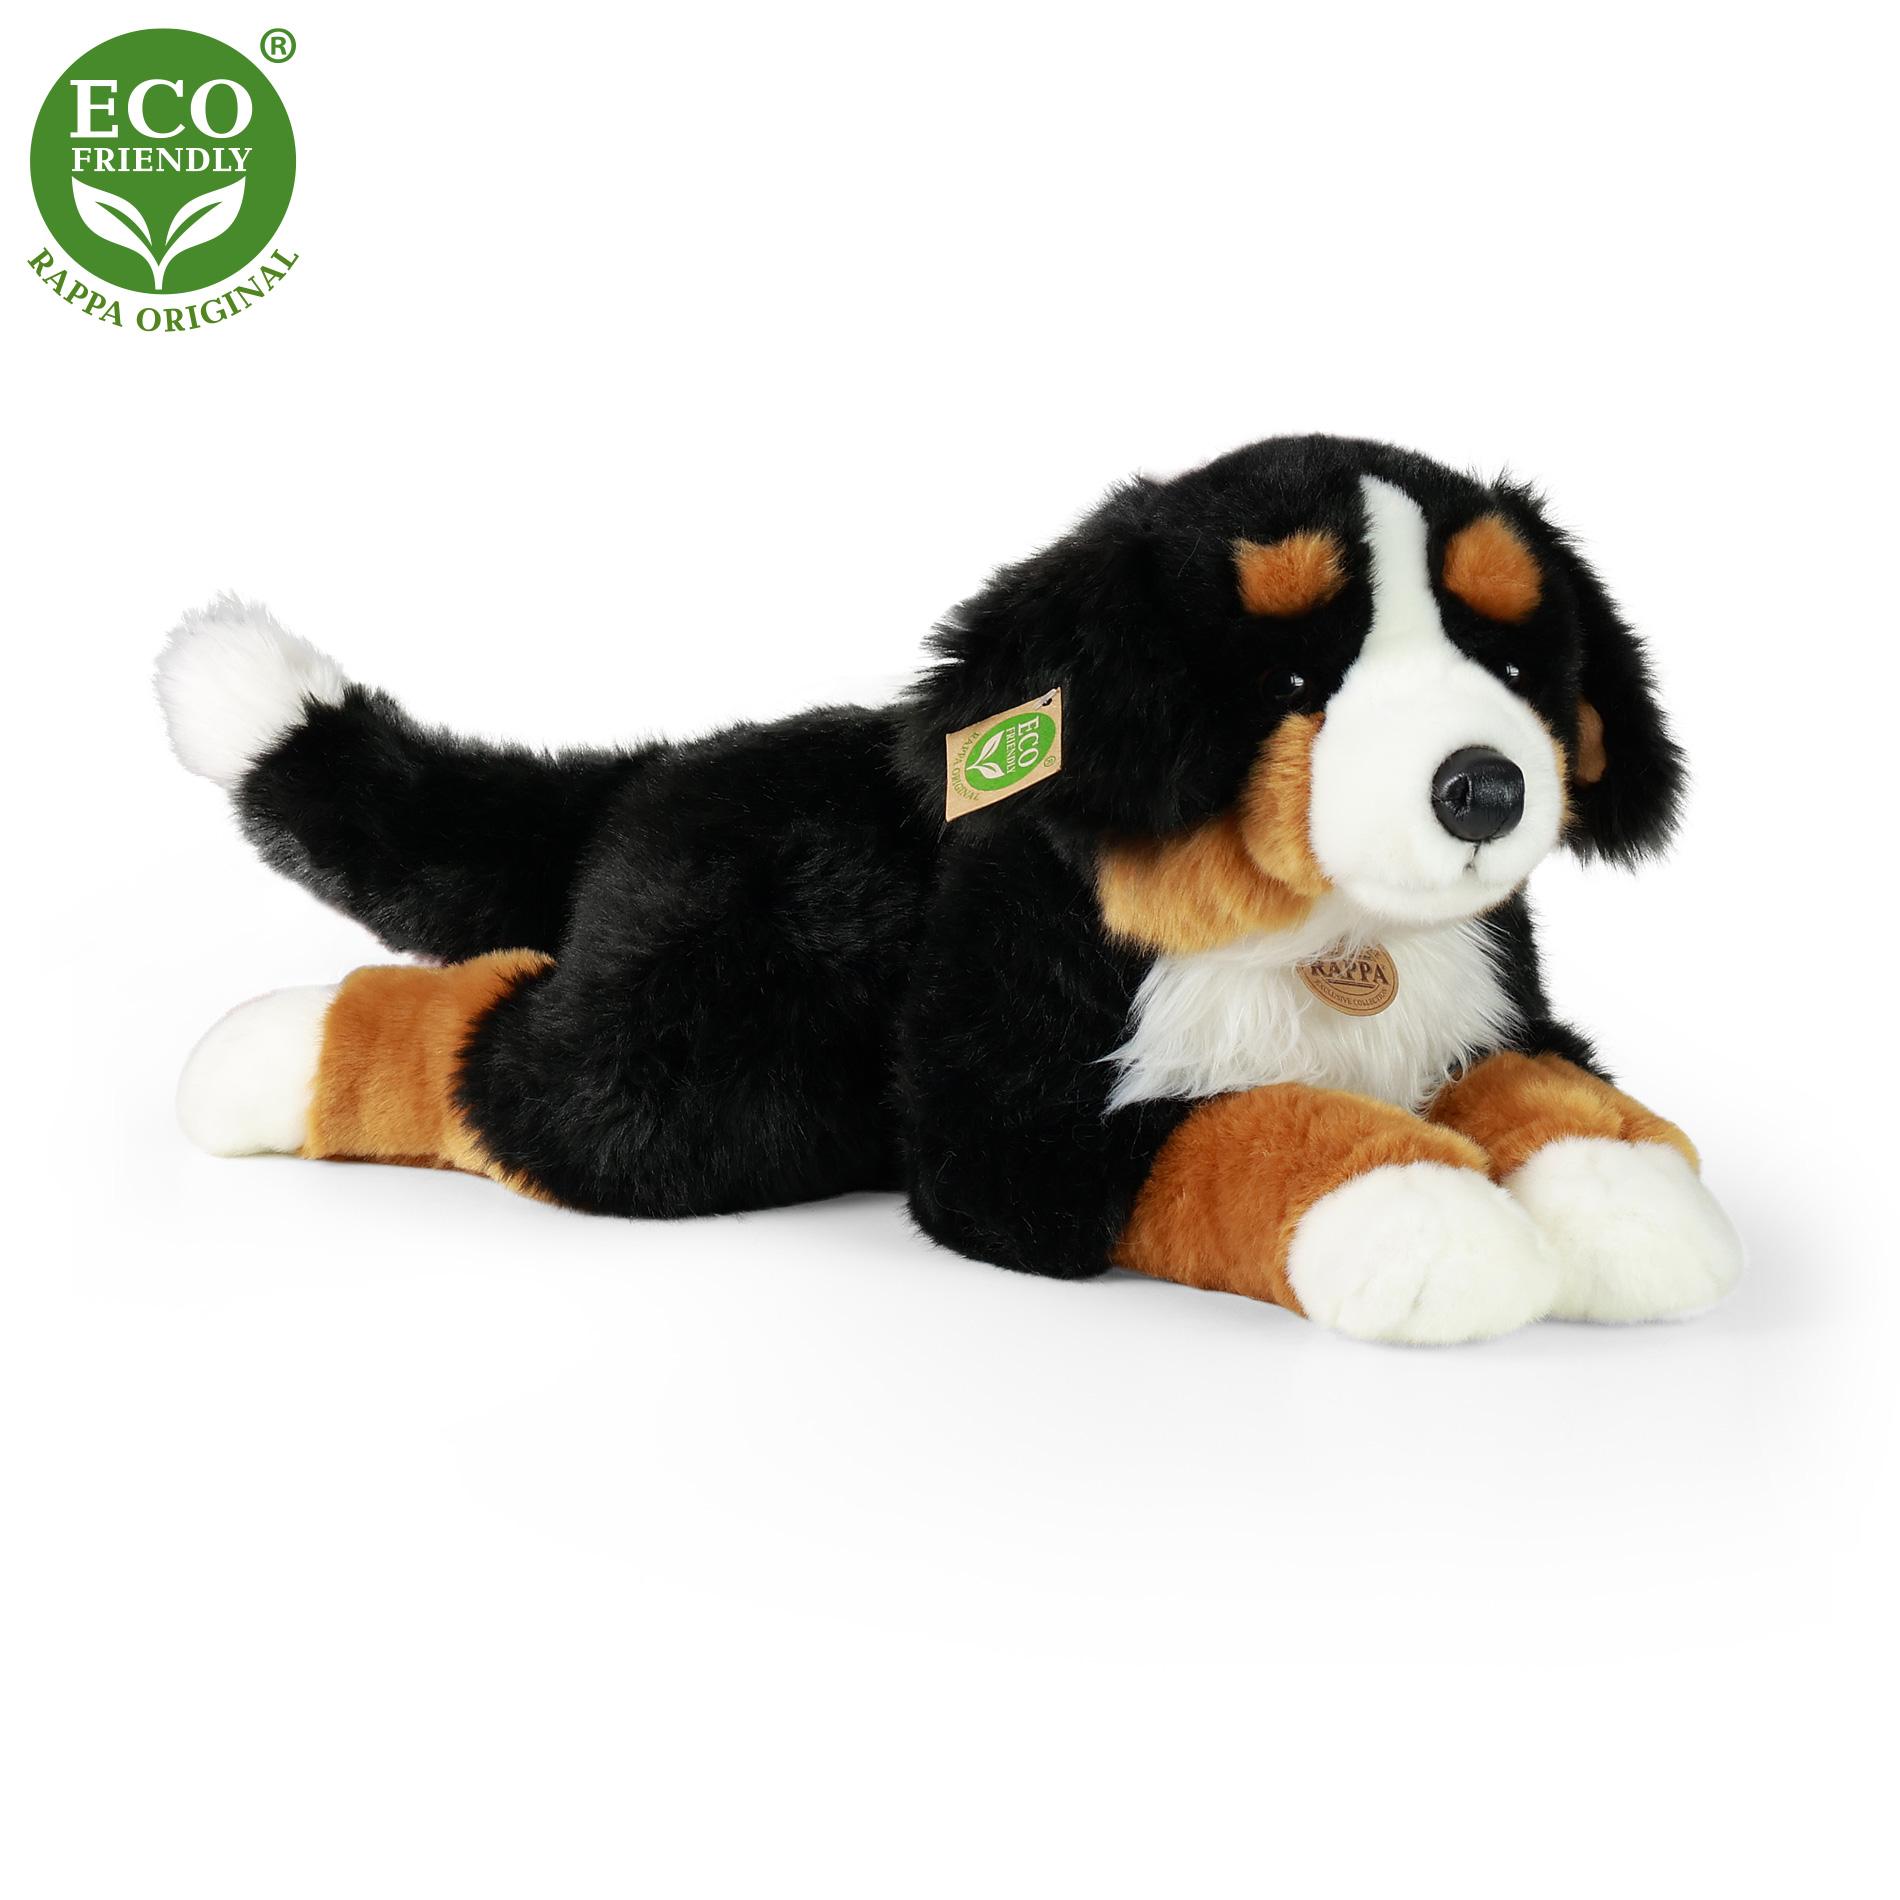 veľký plyšový pes salašnícky ležiaci, 61 cm